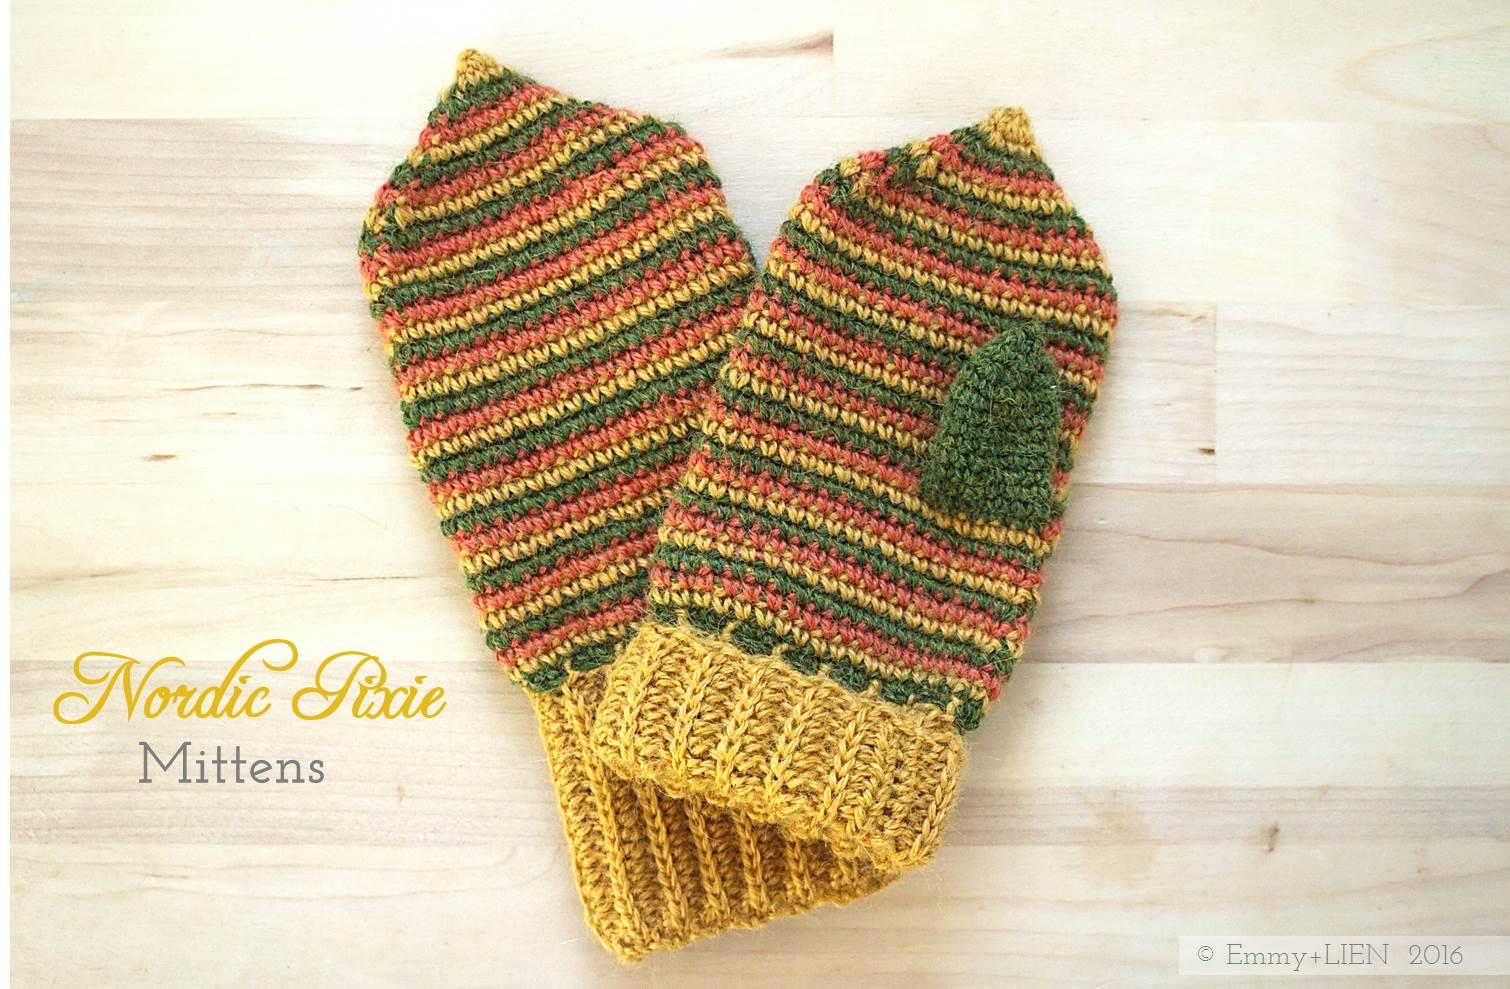 Nordic Pixie Mittens || a crochet pattern by Emmy + LIEN